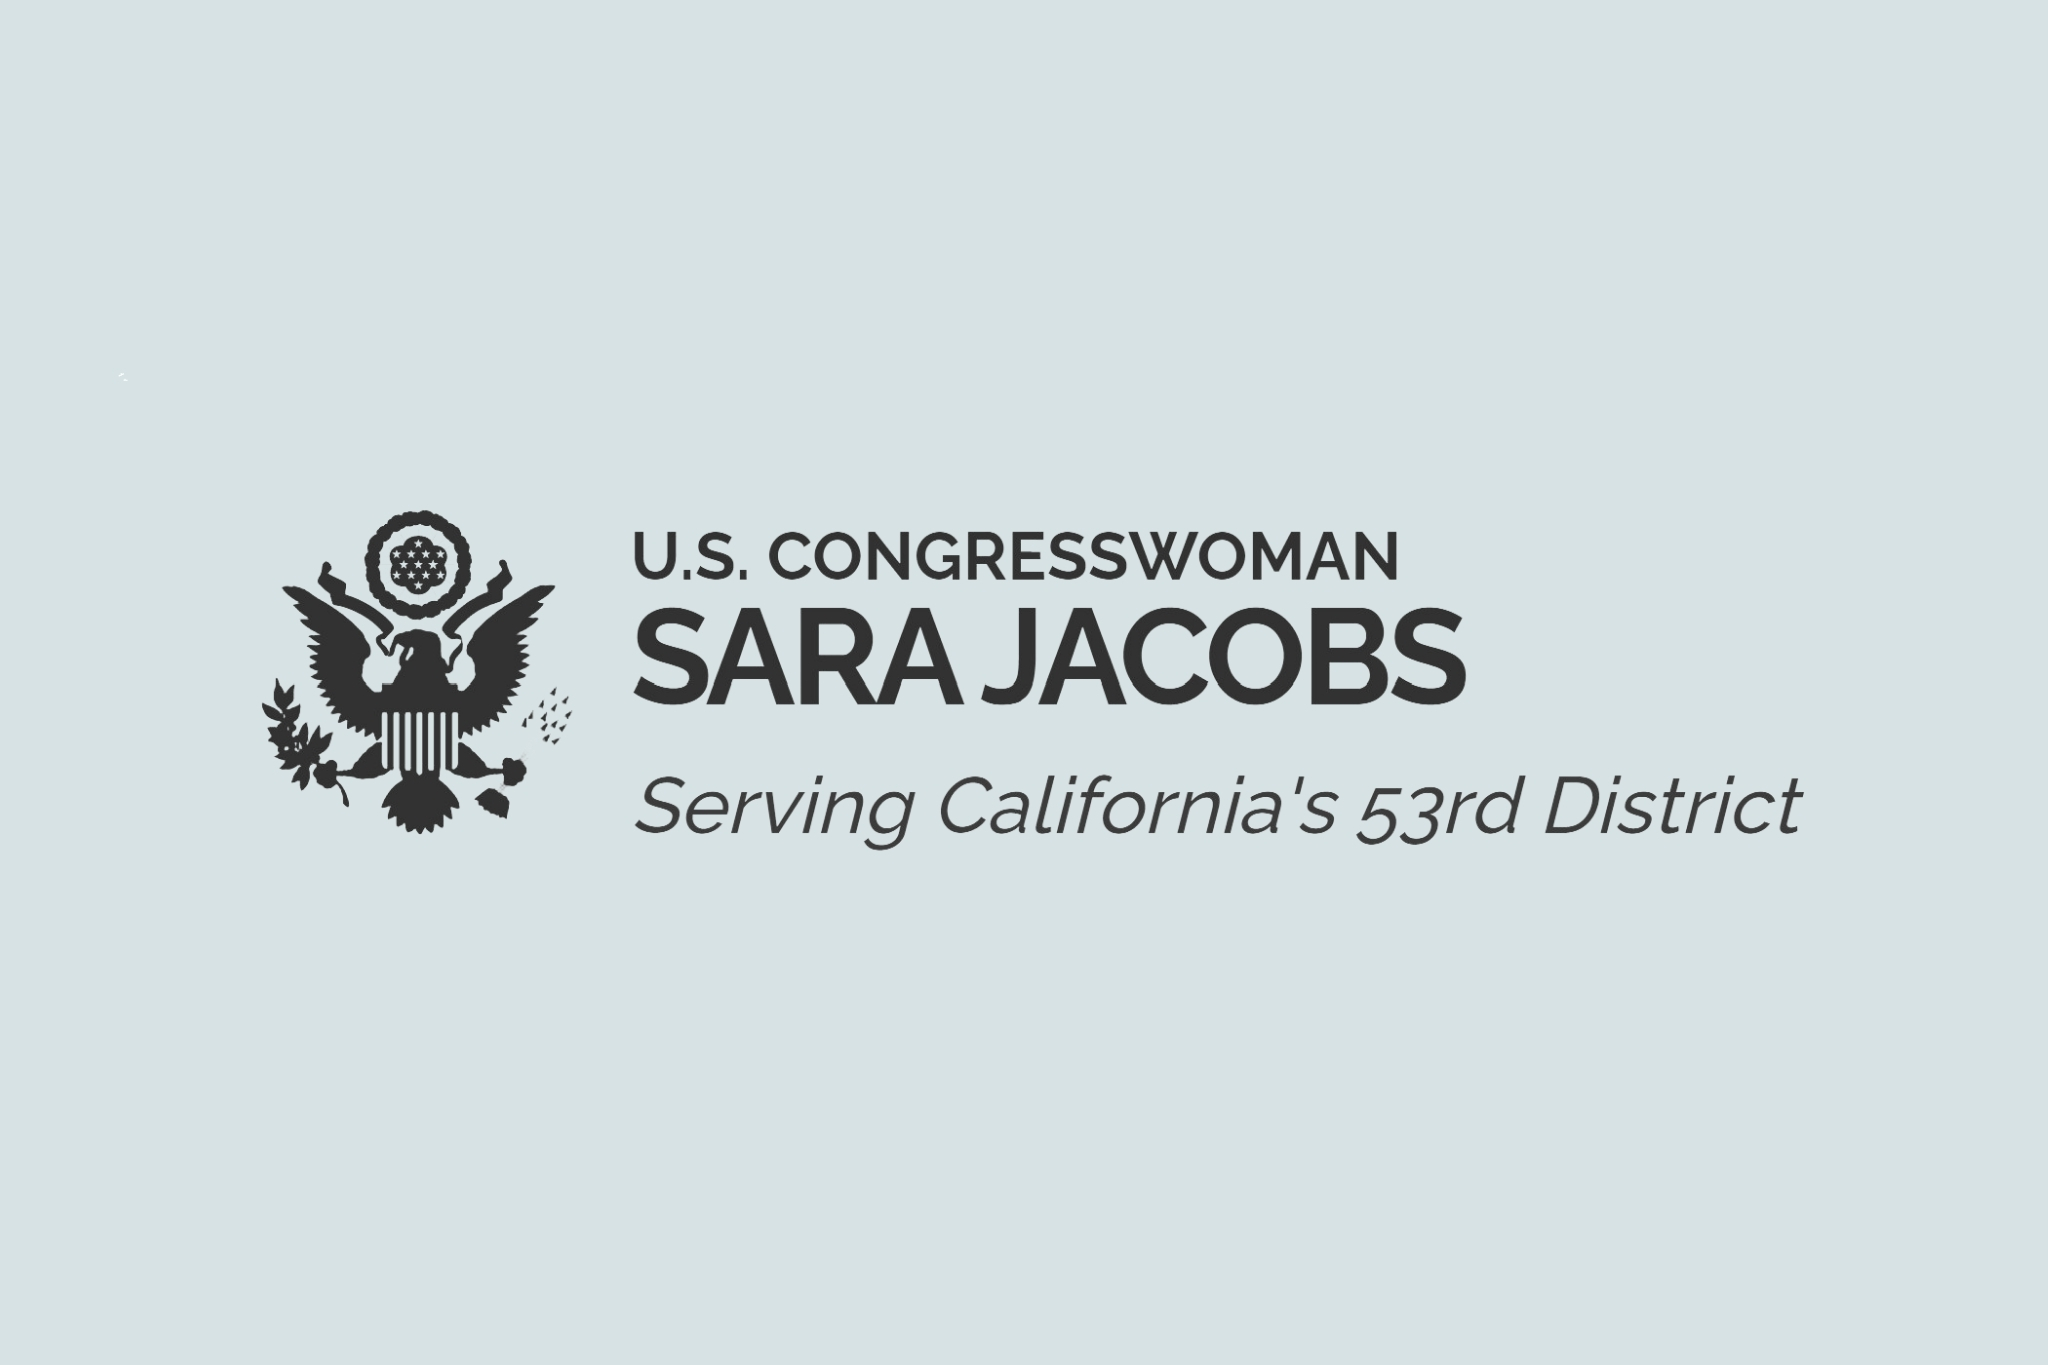 U.S. Congresswoman Sara Jacobs serving California's 53rd District